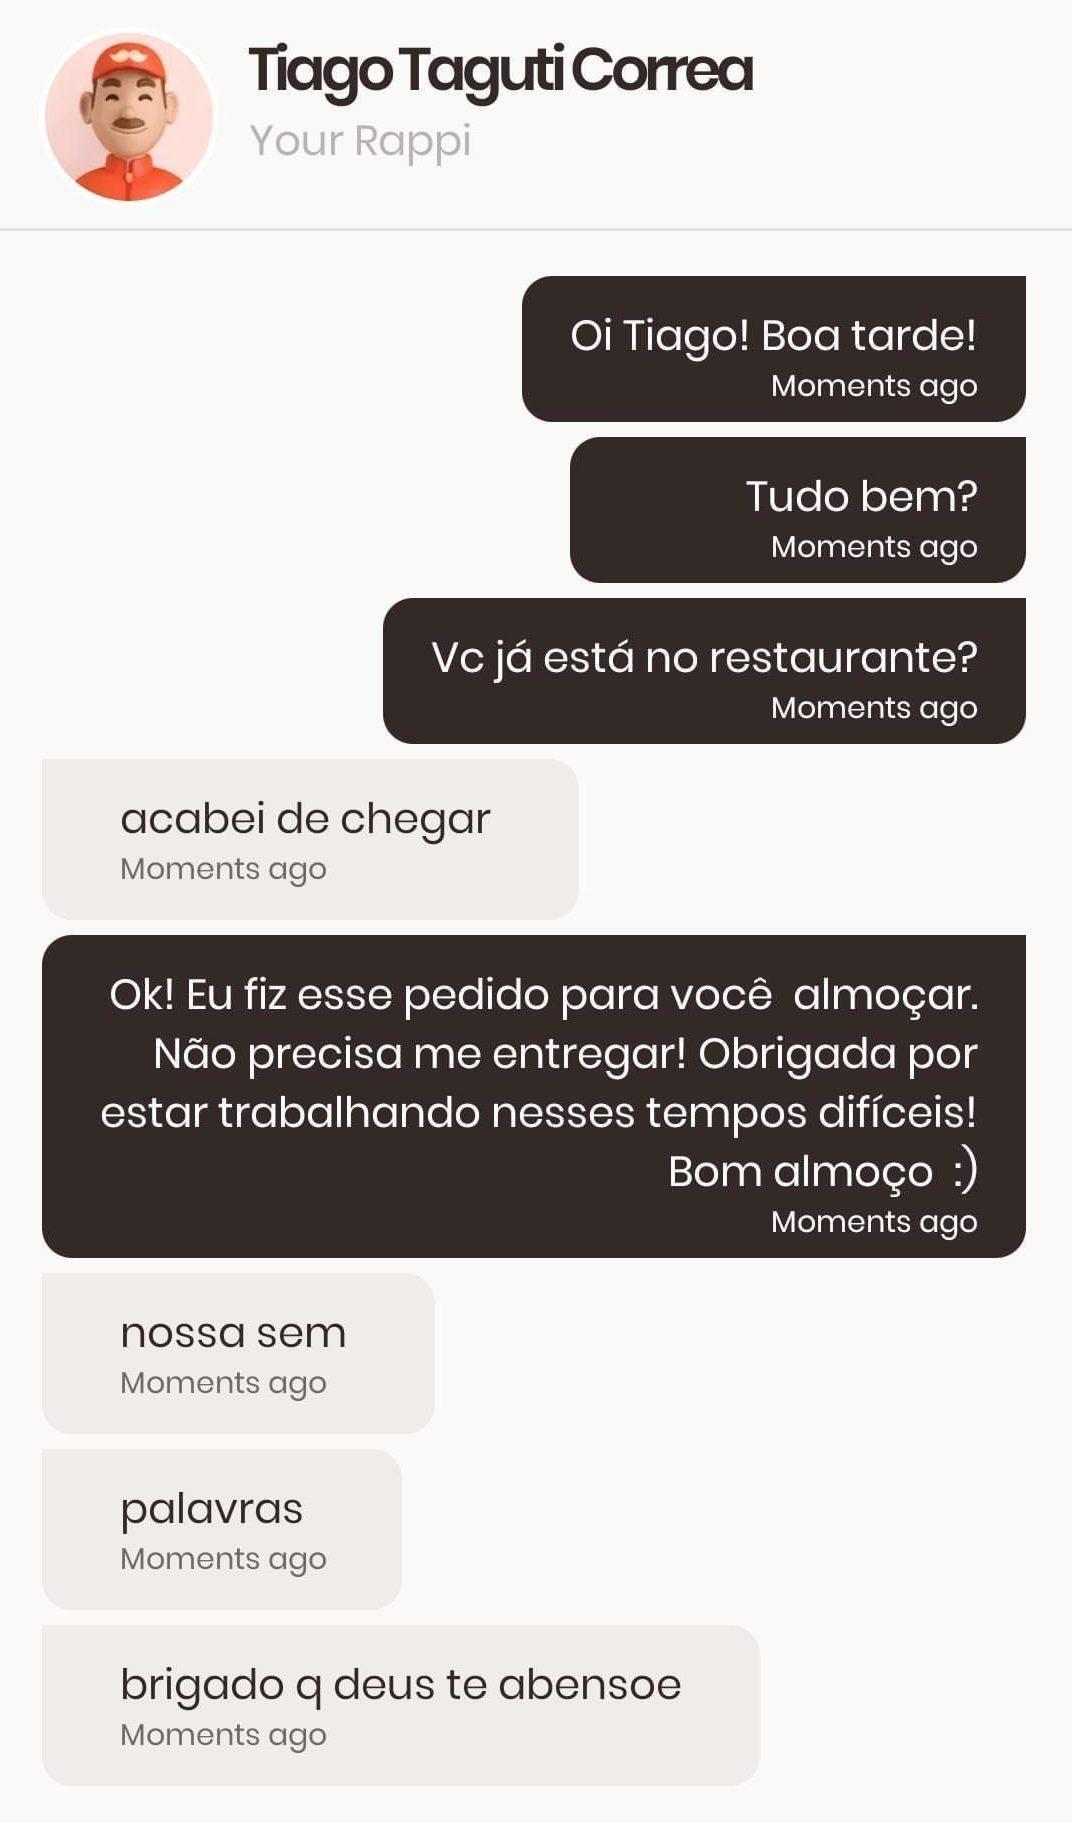 conversa de app de entrega de comida